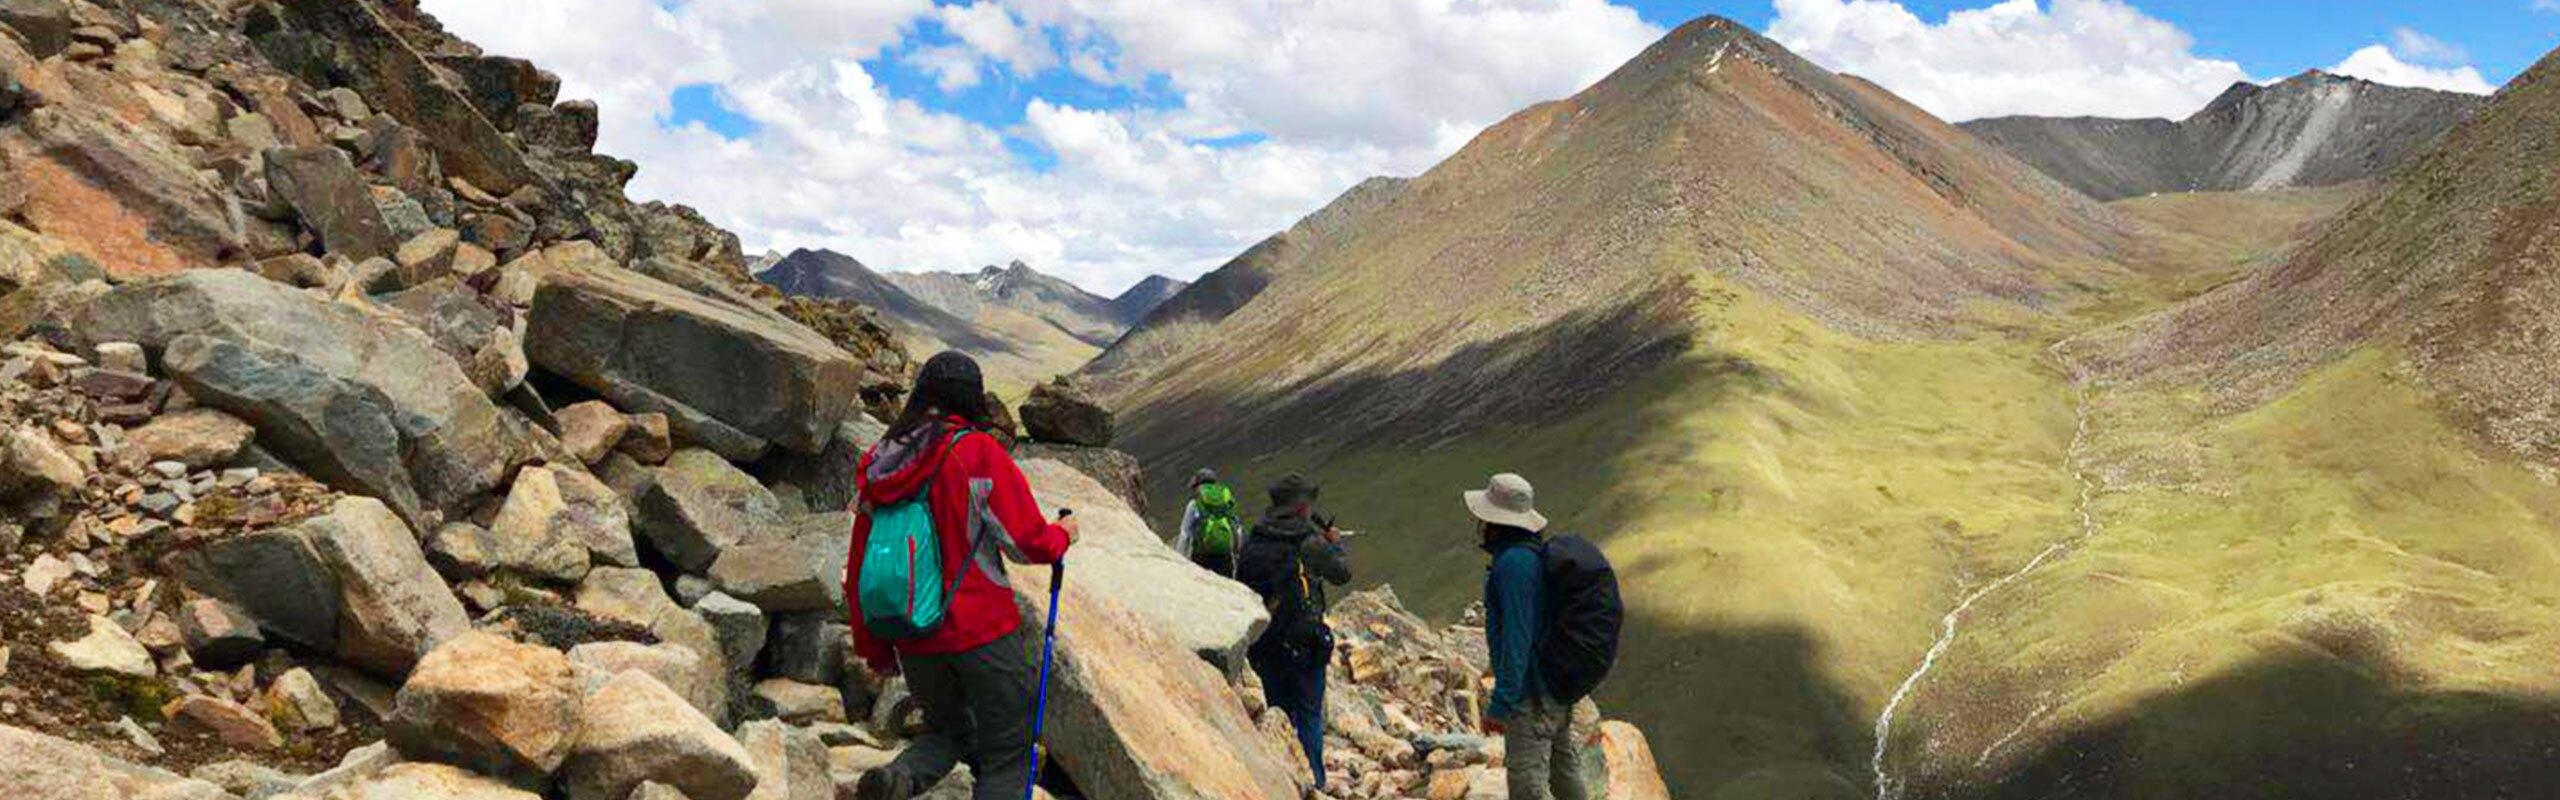 9-Day Tibet Tour with Lhasa and a Ganden–Samye Trek